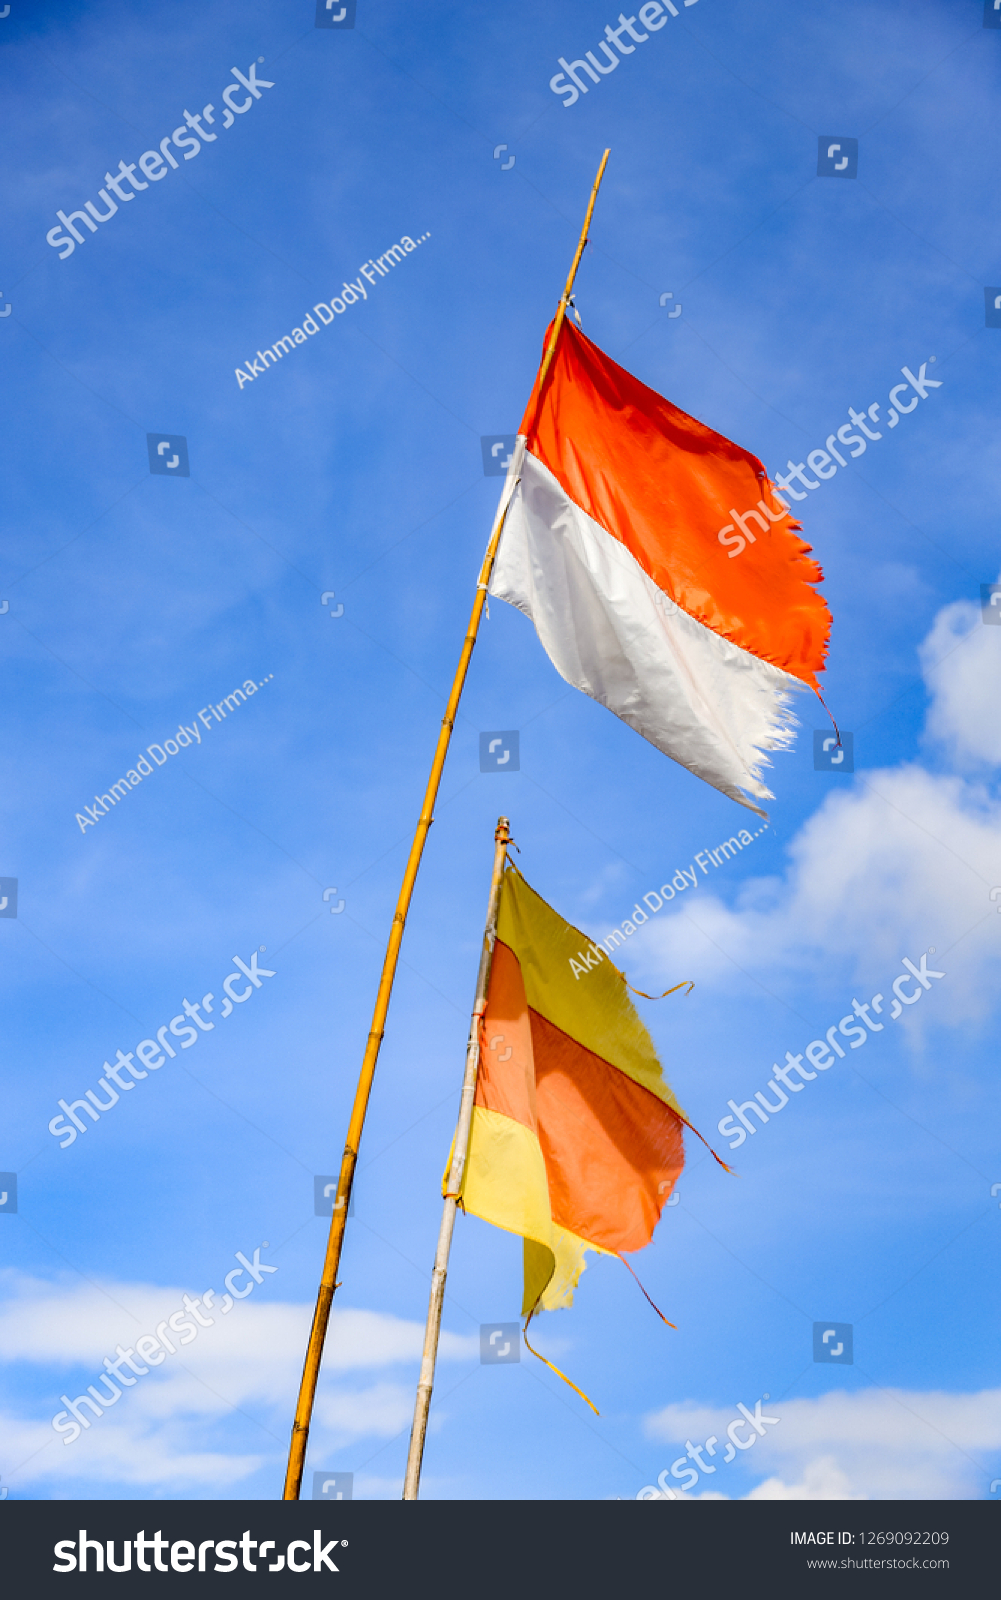 bendera merah putih indonesian national flag stock photo edit now 1269092209 shutterstock